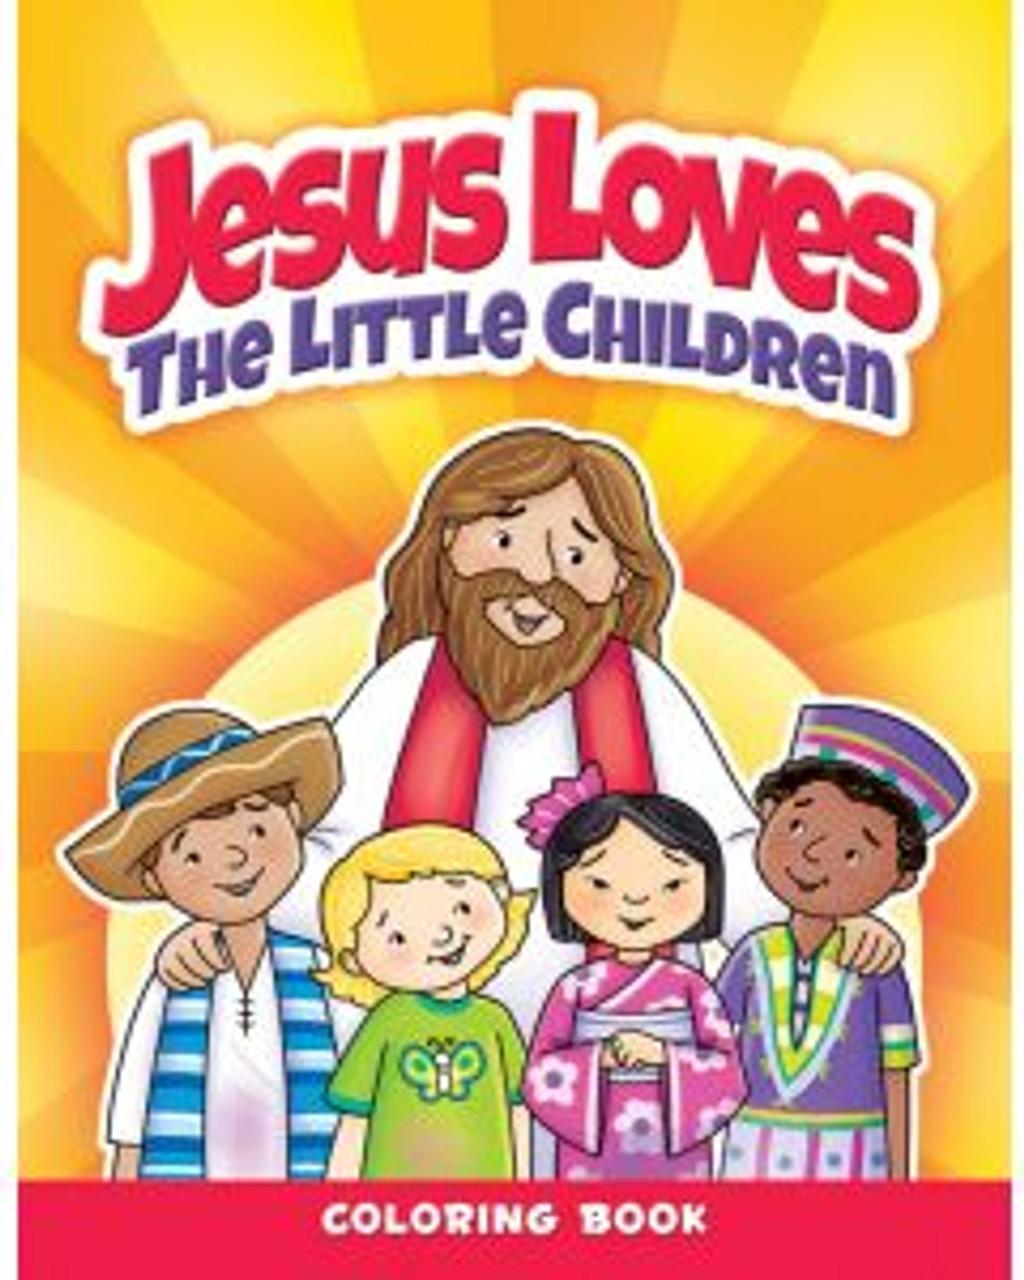 Jesus Loves The Little Children (coloring book)